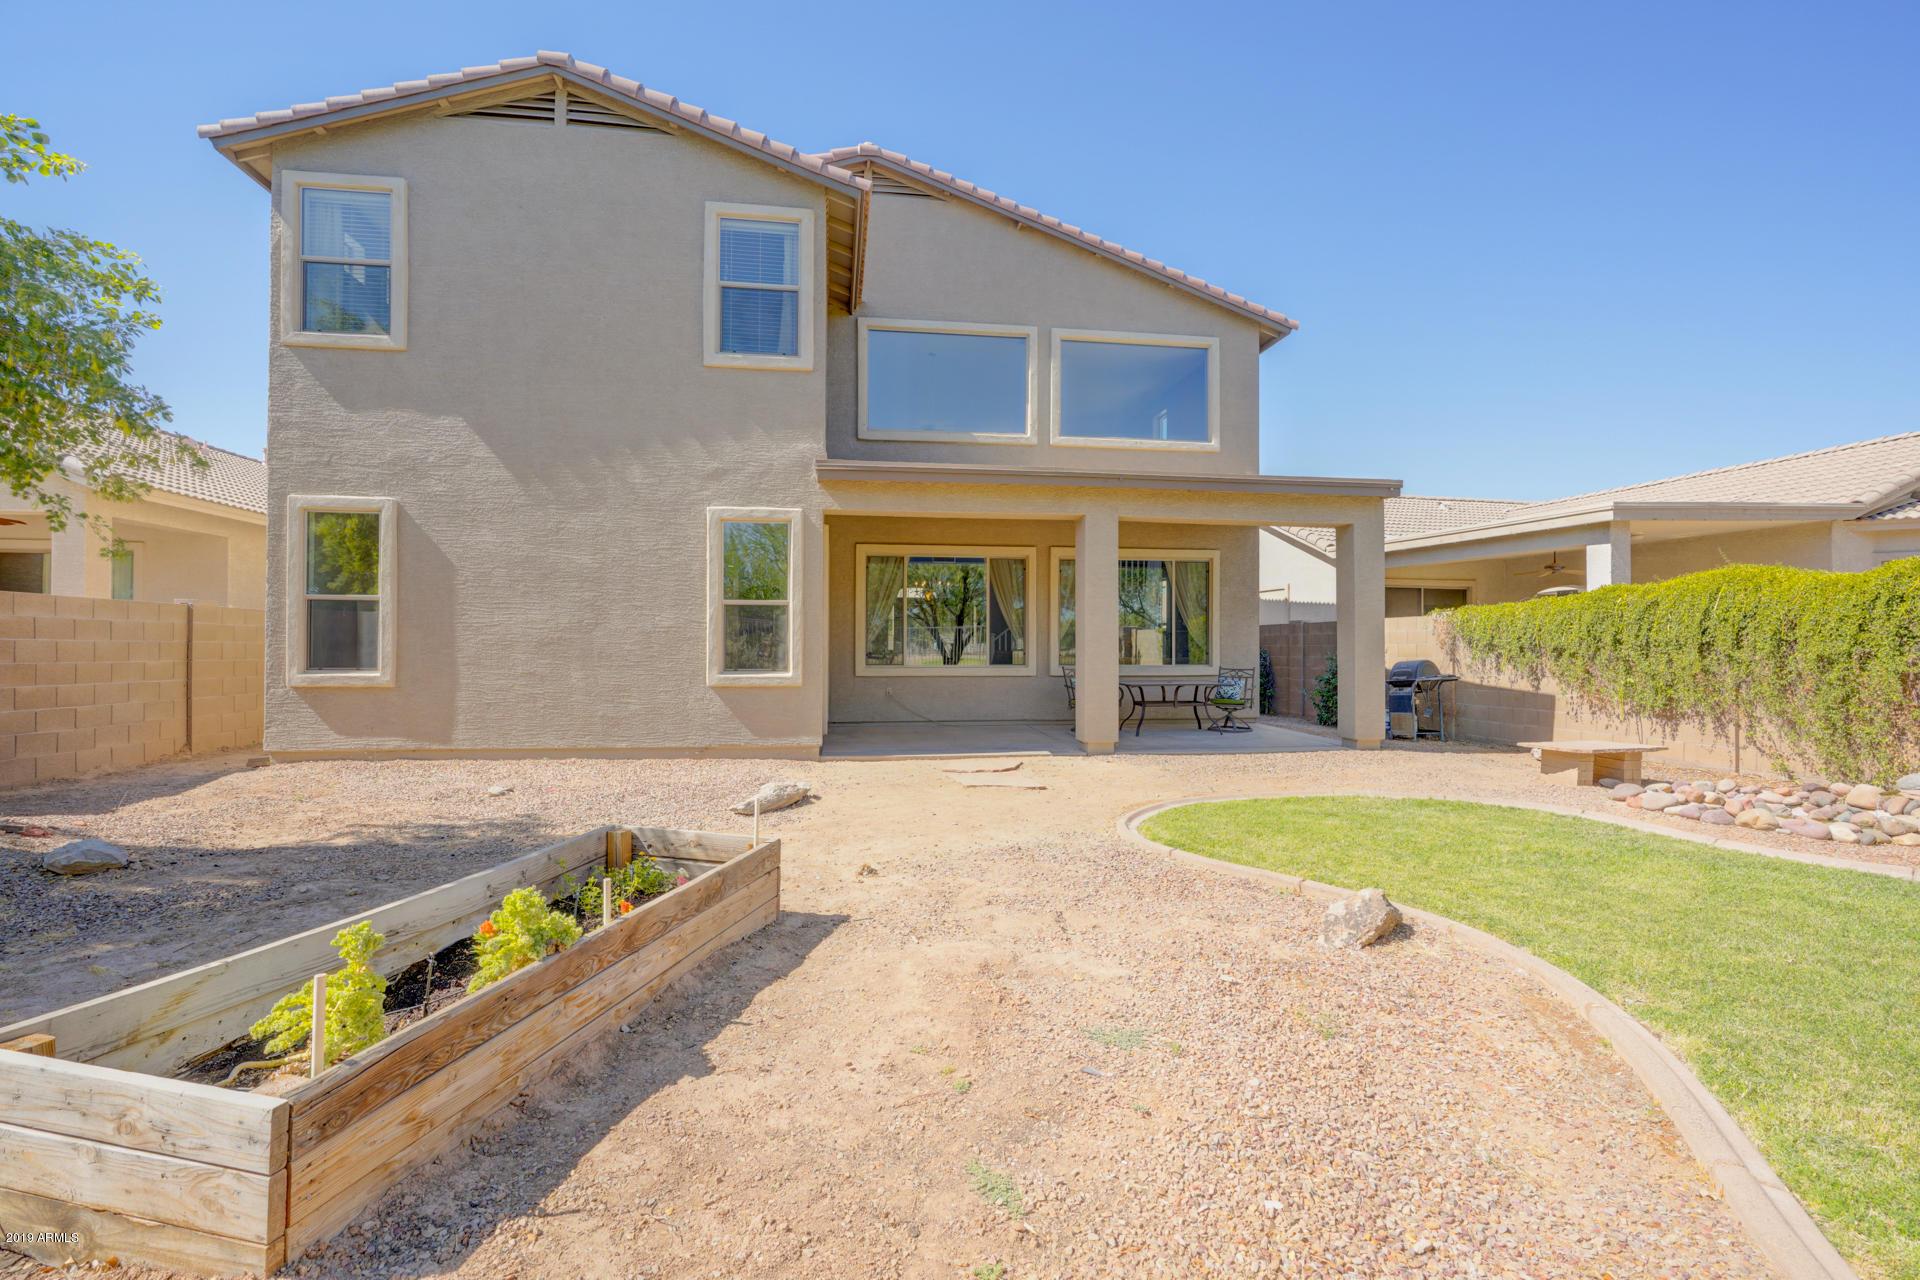 MLS 5945035 43324 W RIO BRAVO Drive, Maricopa, AZ 85138 Maricopa AZ Golf